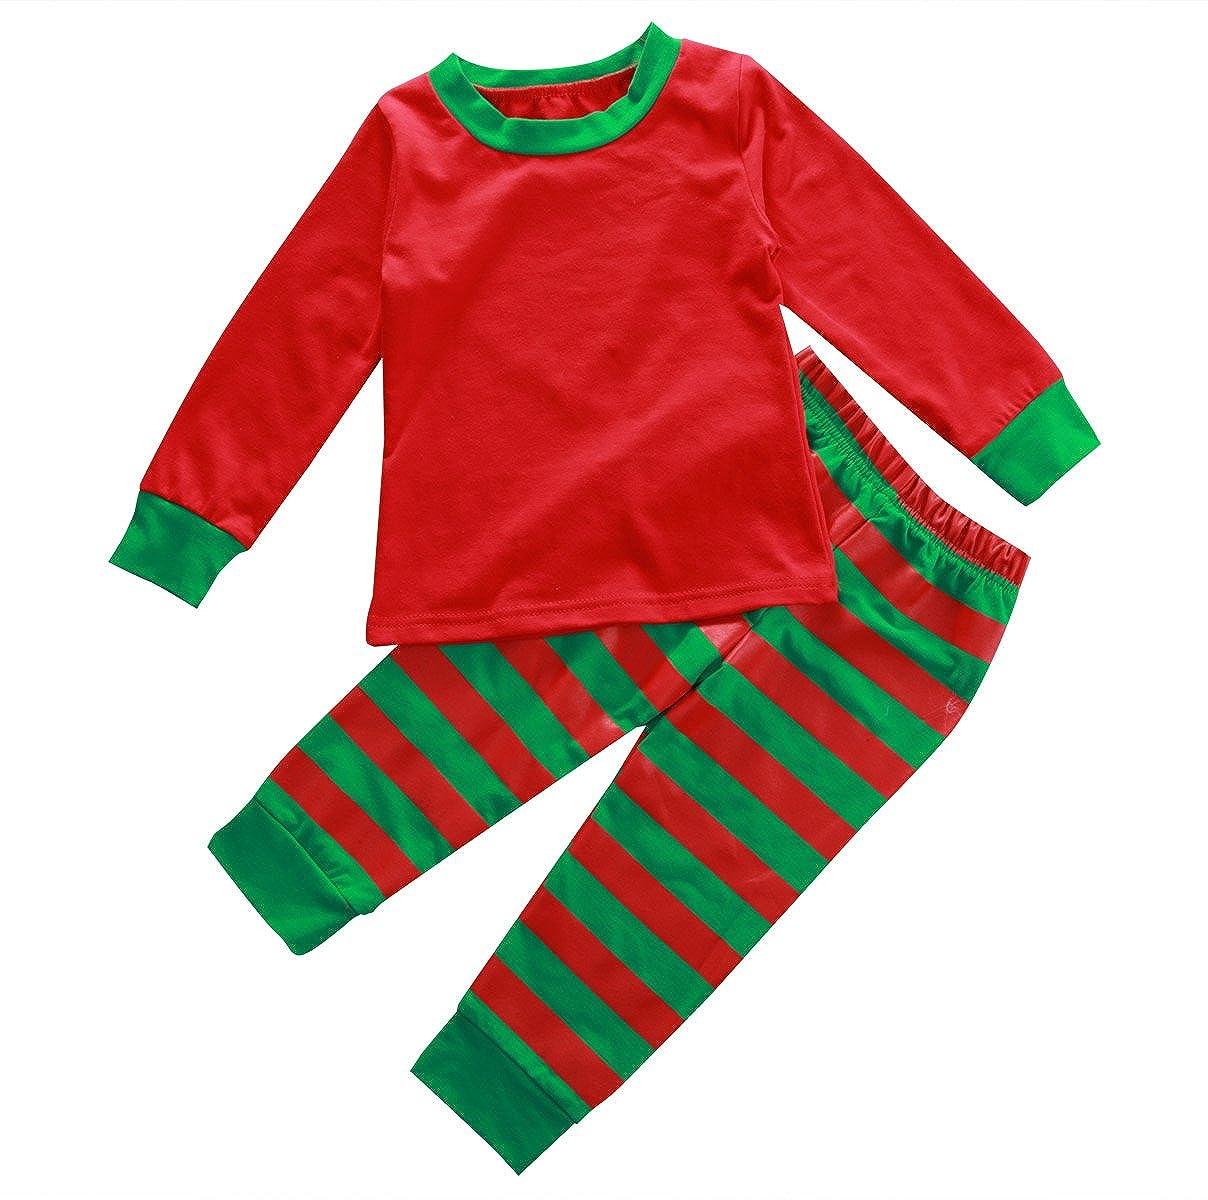 Little Boys Girls Long Sleeve Stripe Top and Pants Christmas Pajamas Set